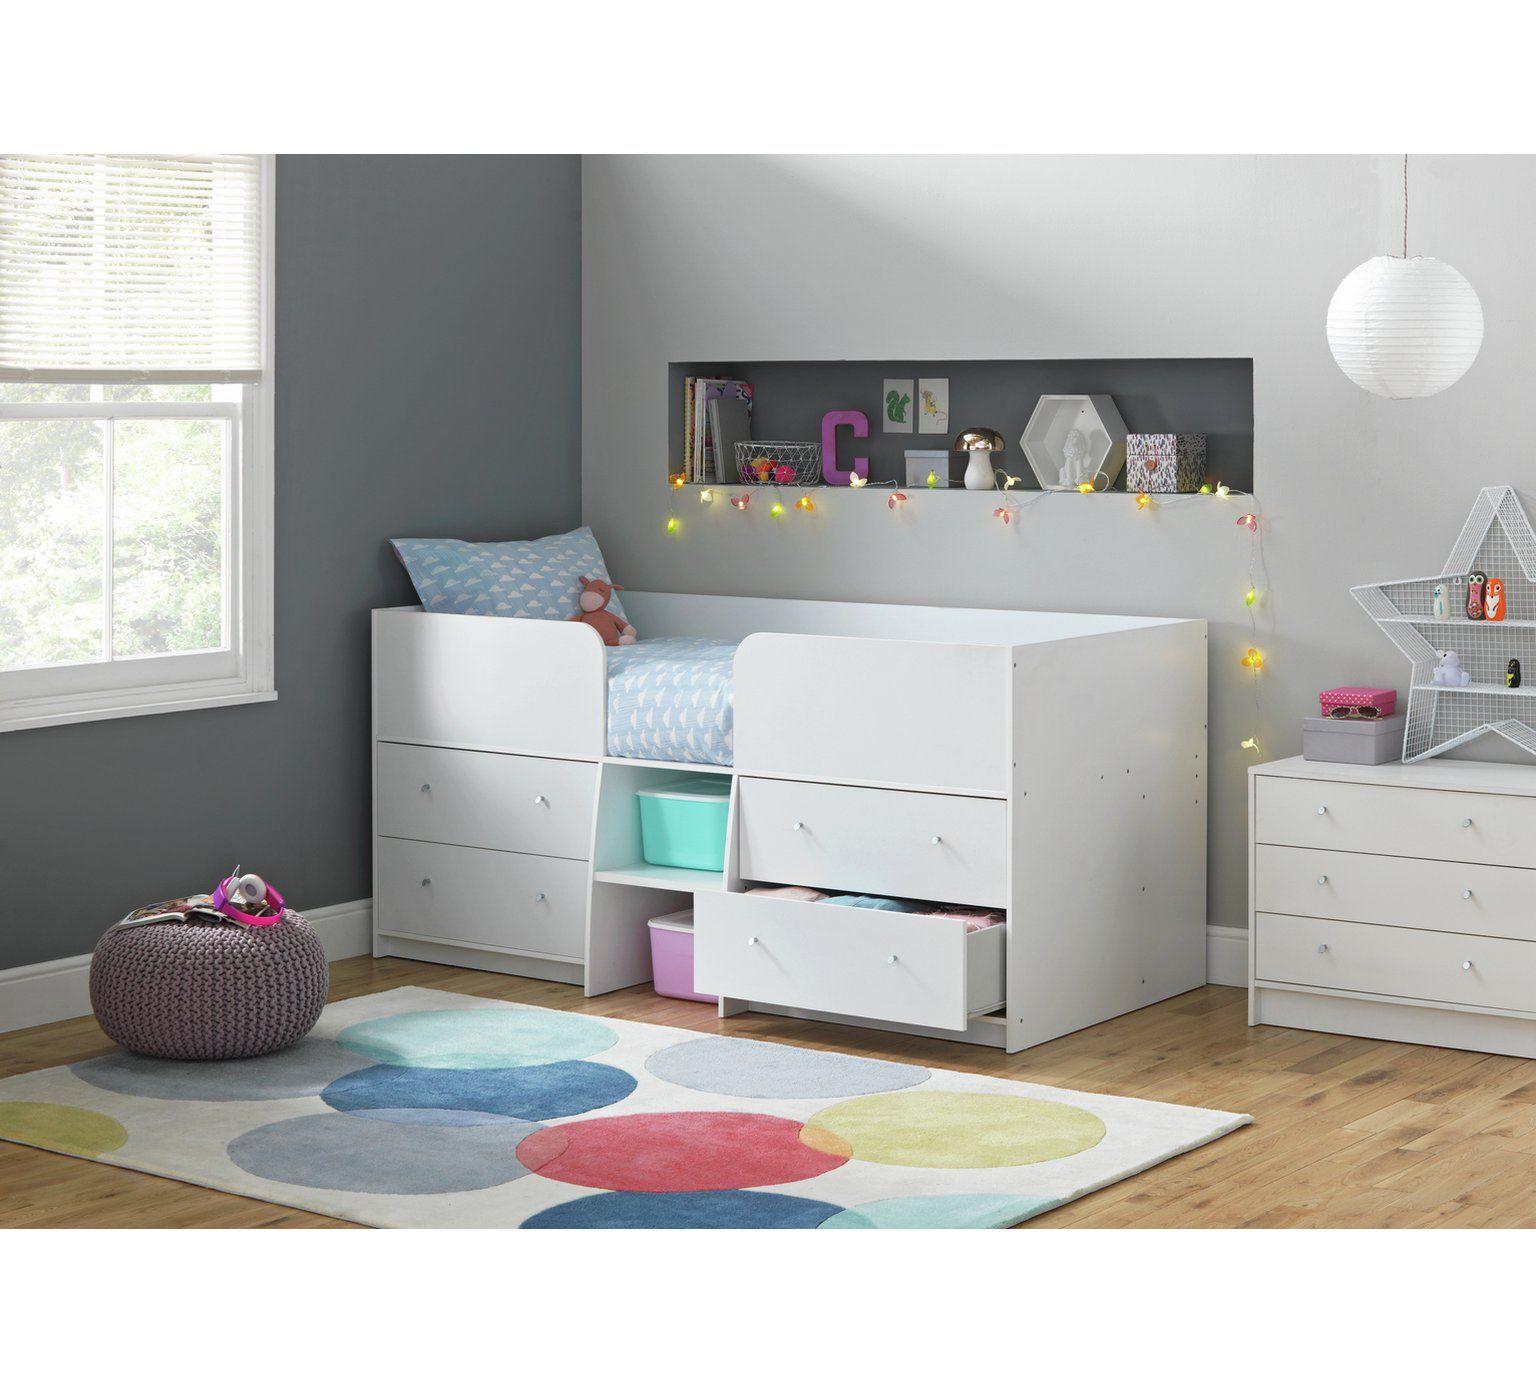 Buy HOME Malibu Shorty Mid Sleeper White at Argos.co.uk